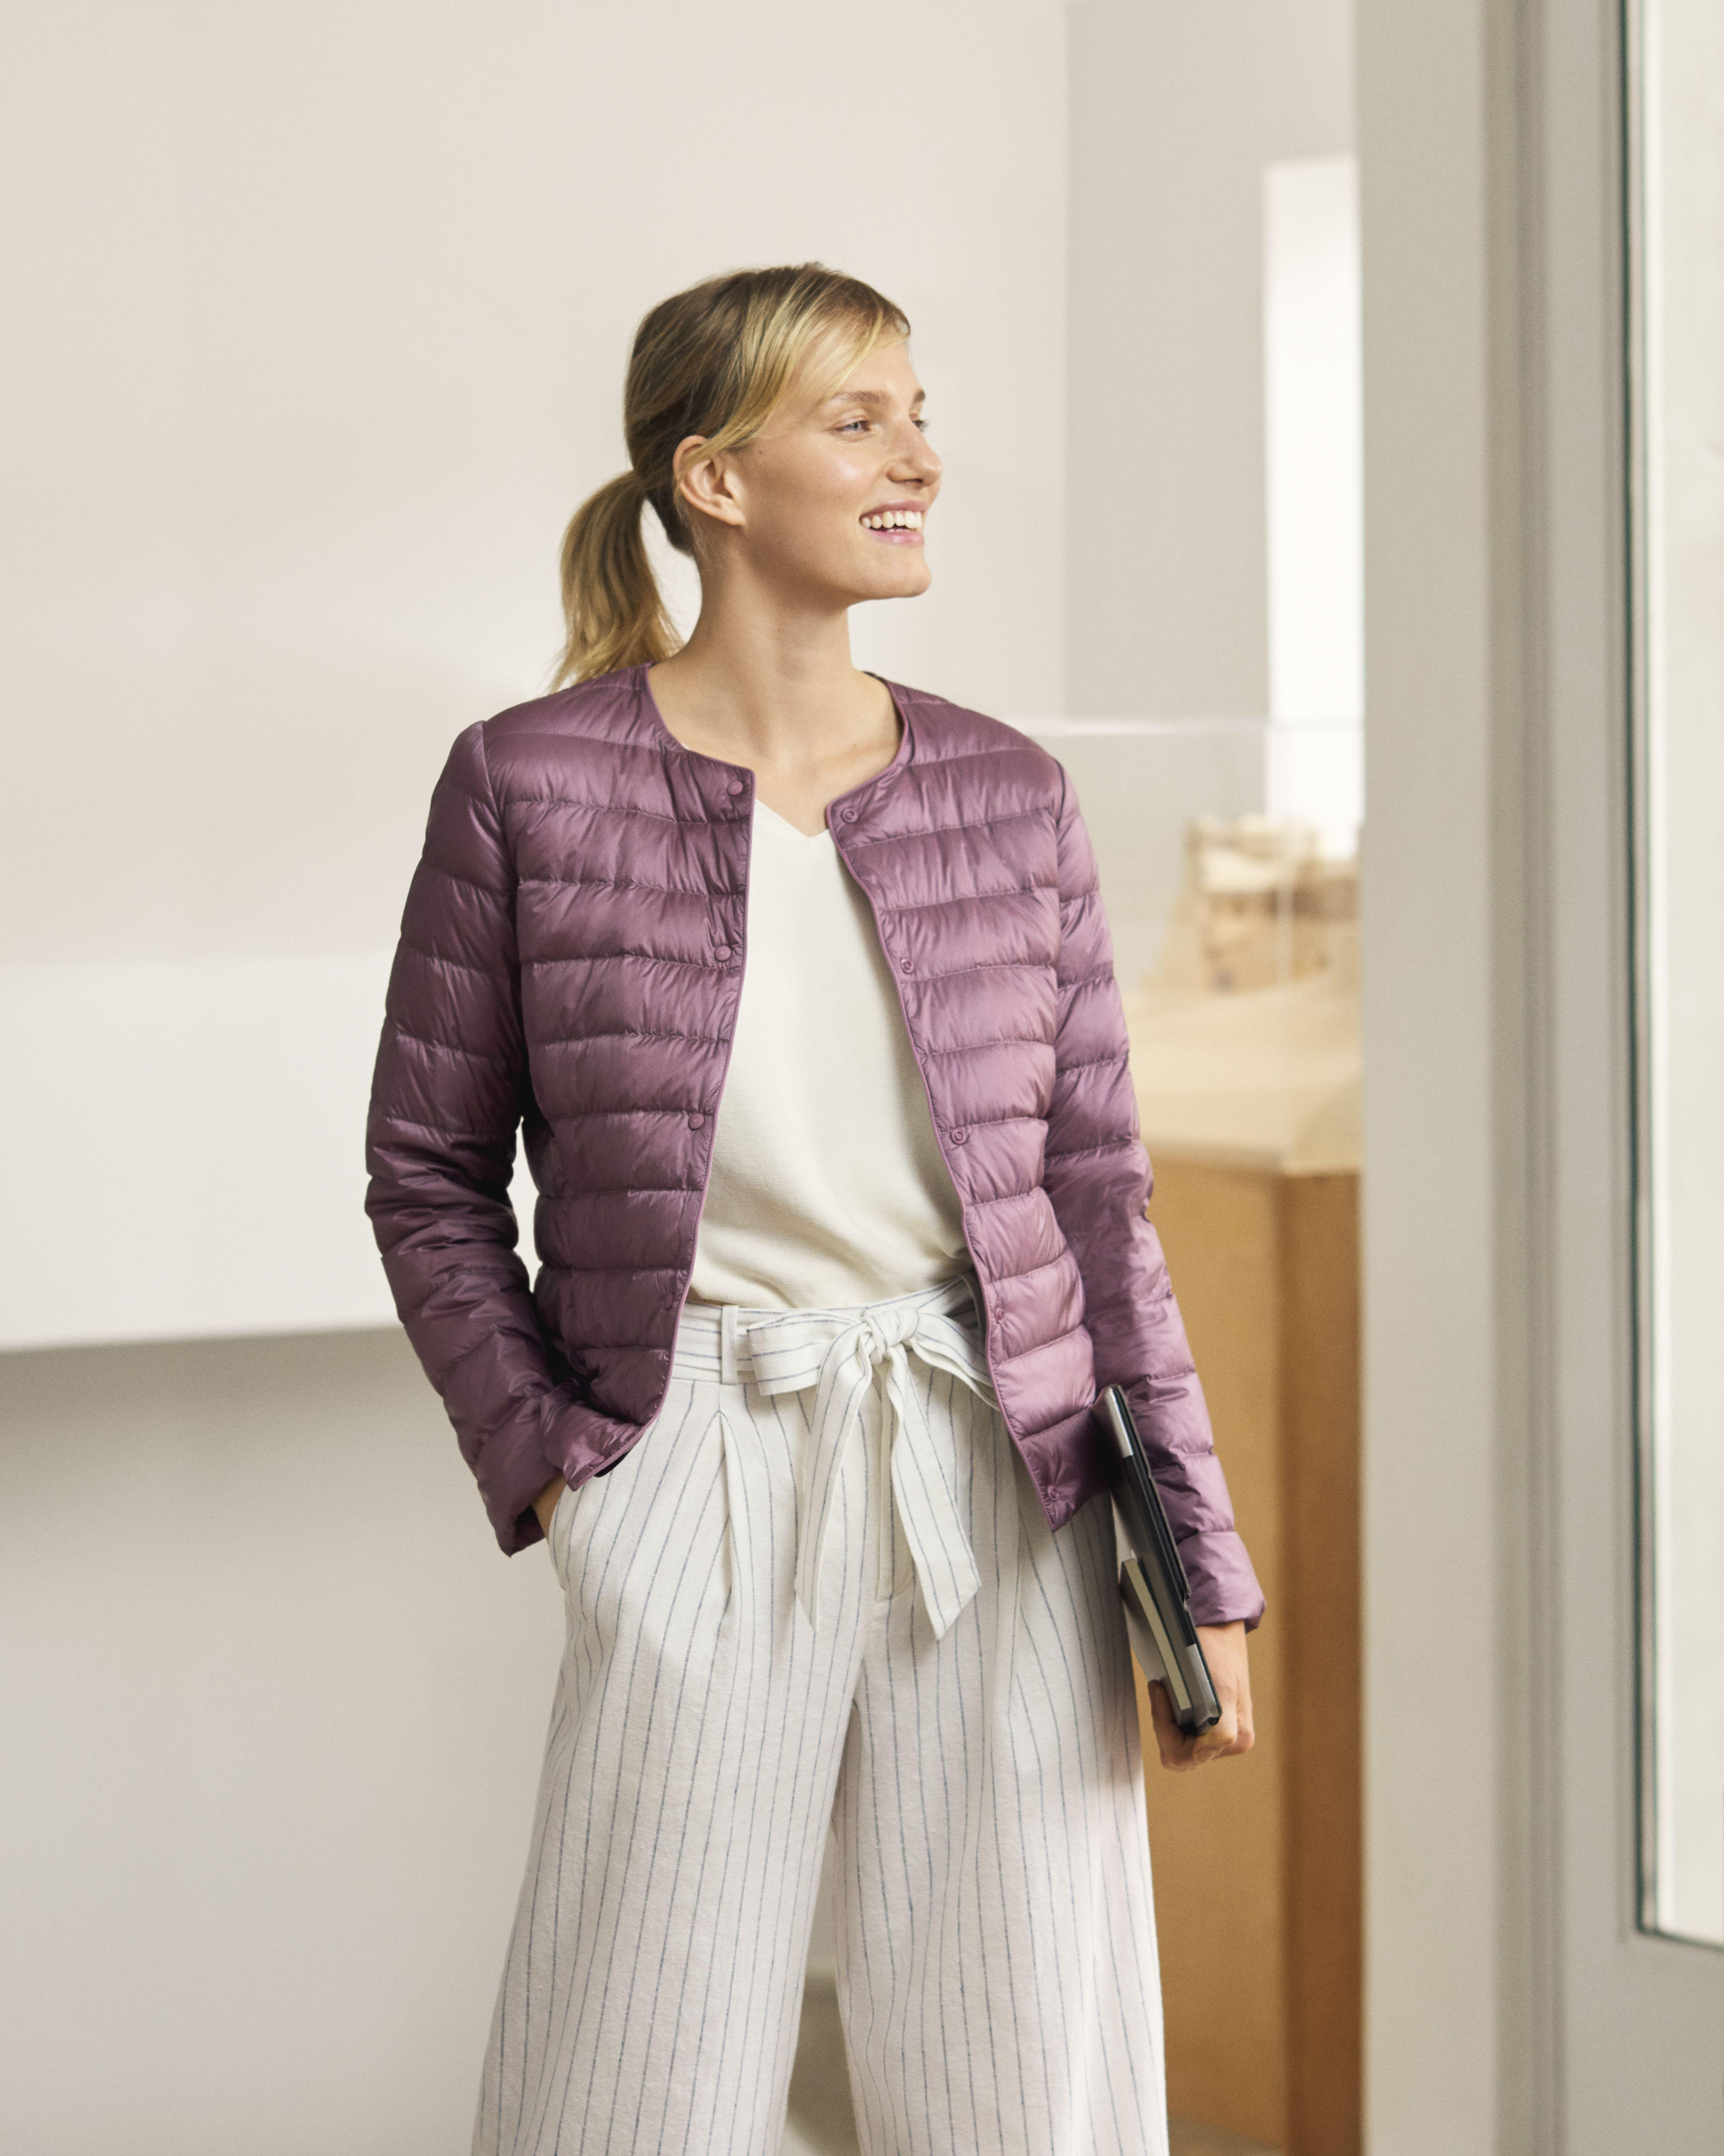 Ultra Light Down Compact Jacket Compact Jacket Sleek Fashion Fashion Week Street Style [ 6144 x 4912 Pixel ]